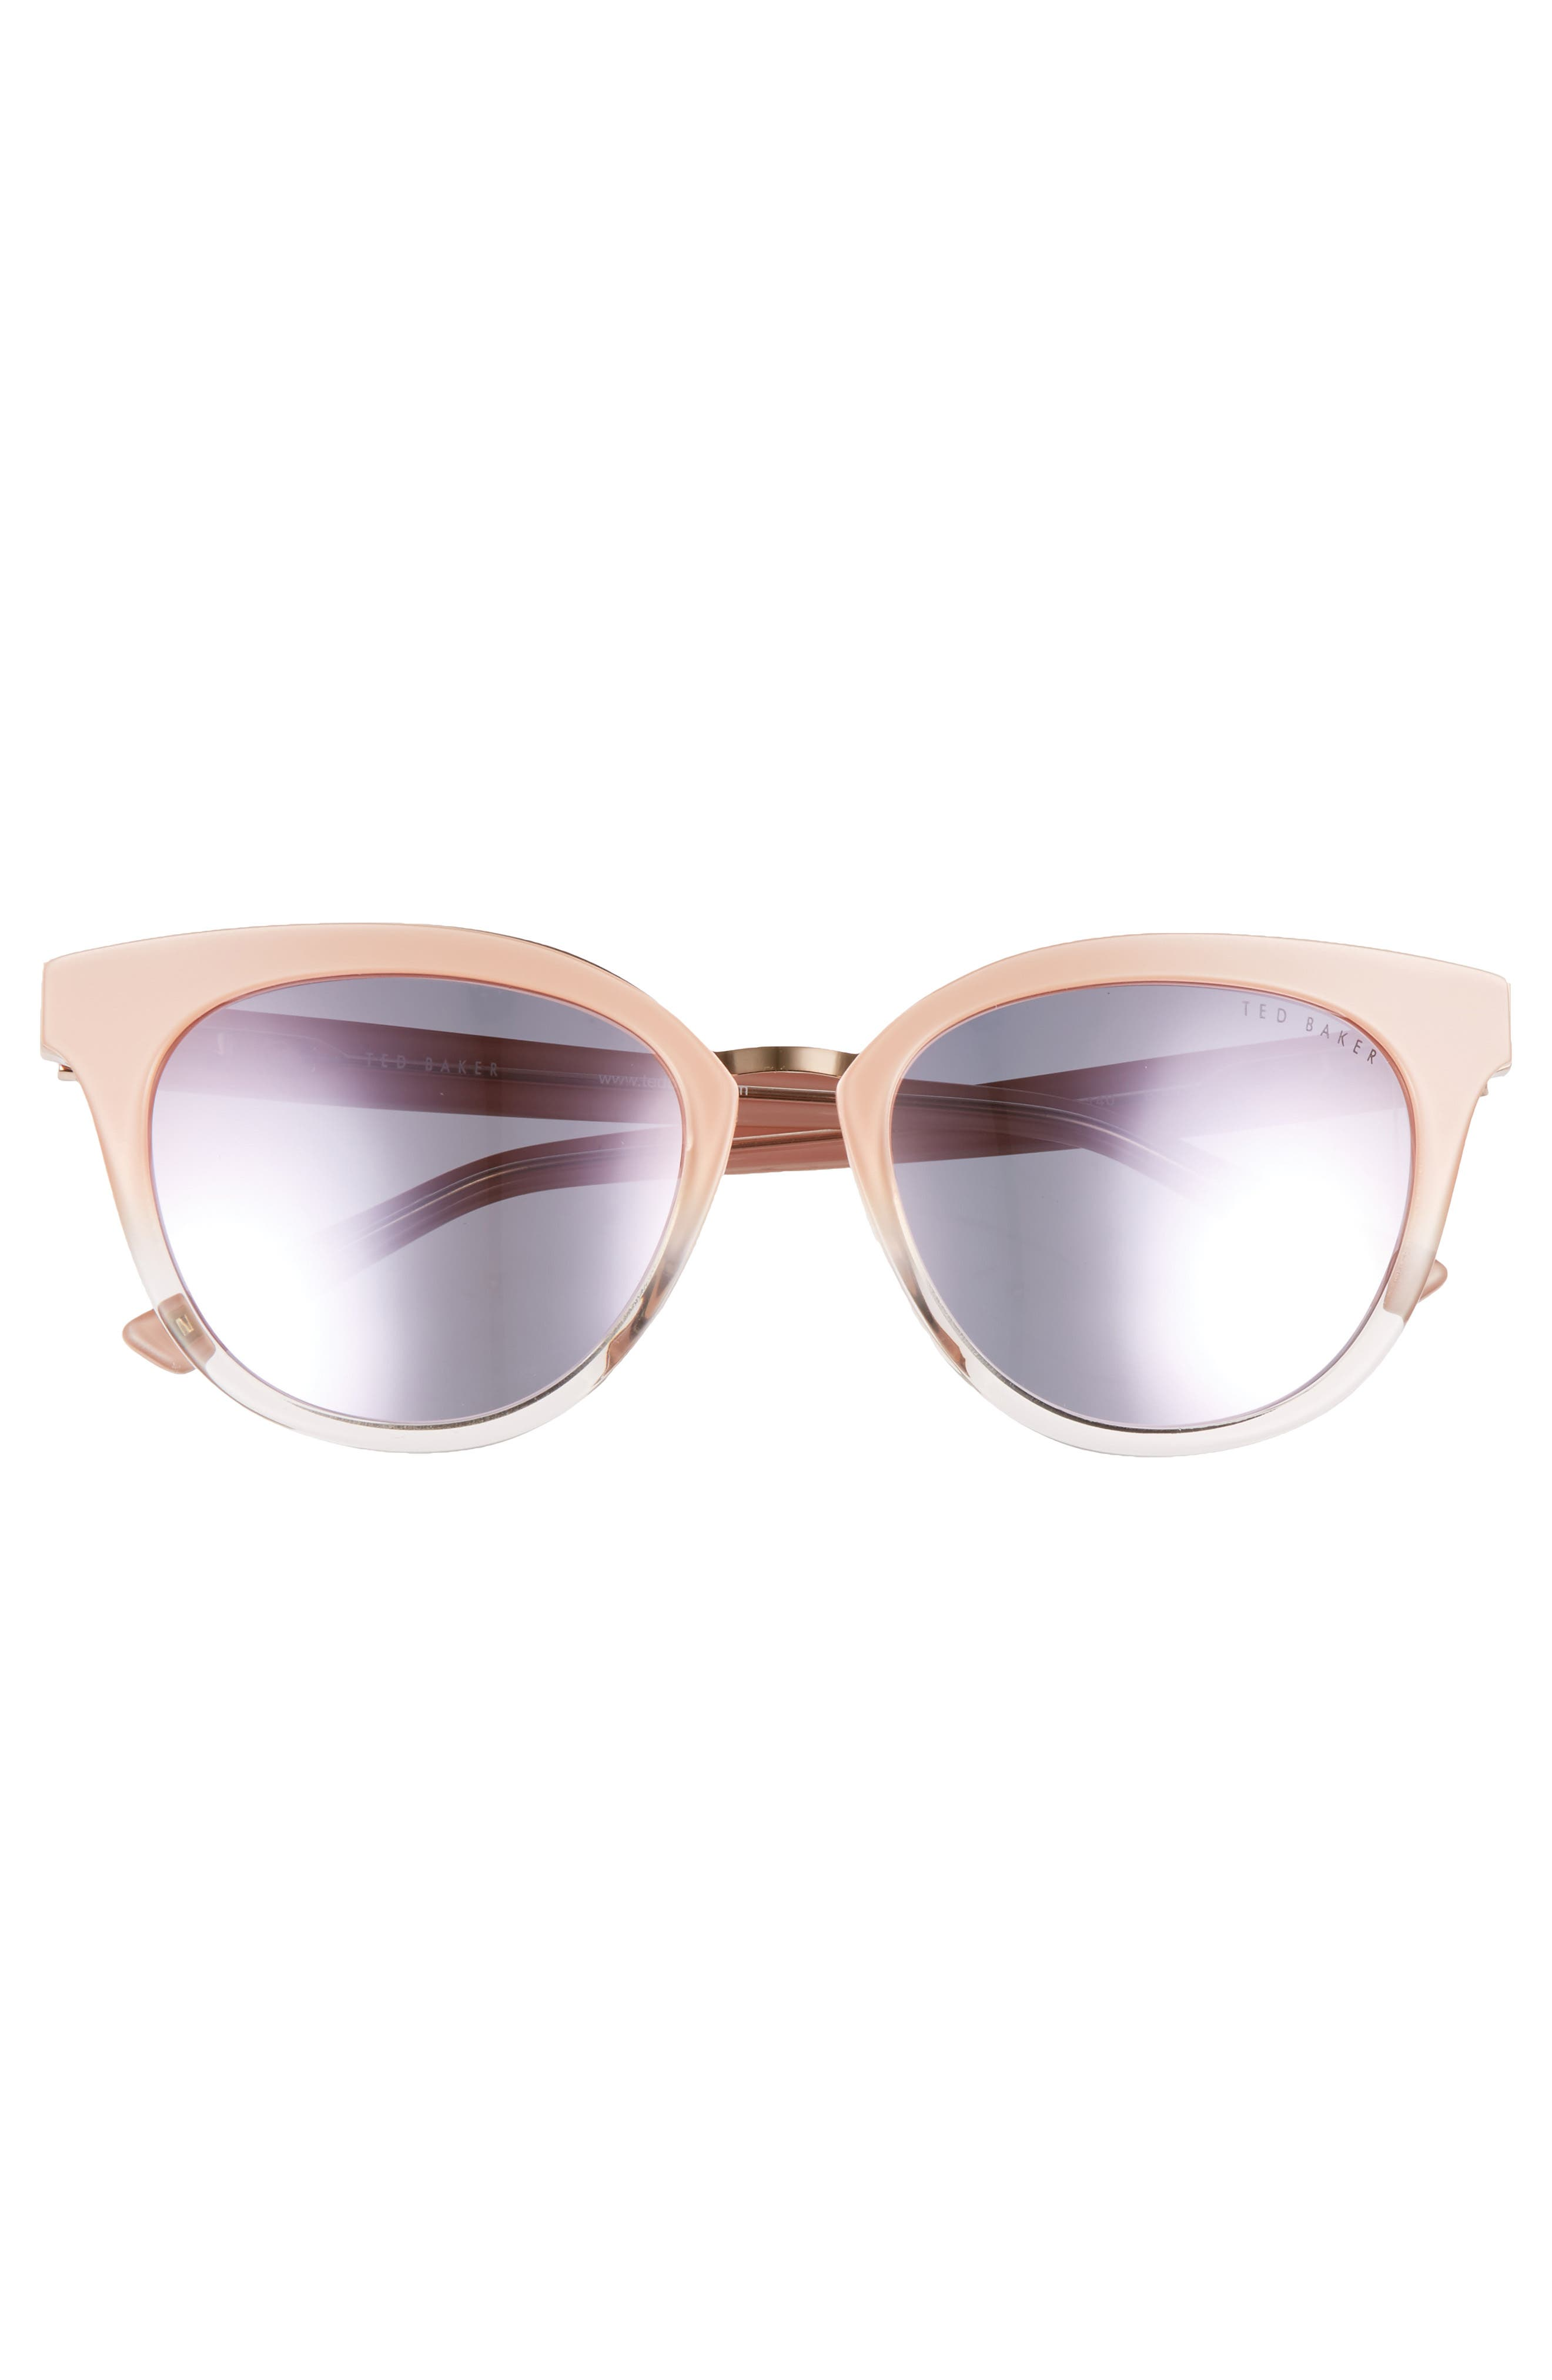 53mm Cat Eye Sunglasses,                             Alternate thumbnail 3, color,                             Blush